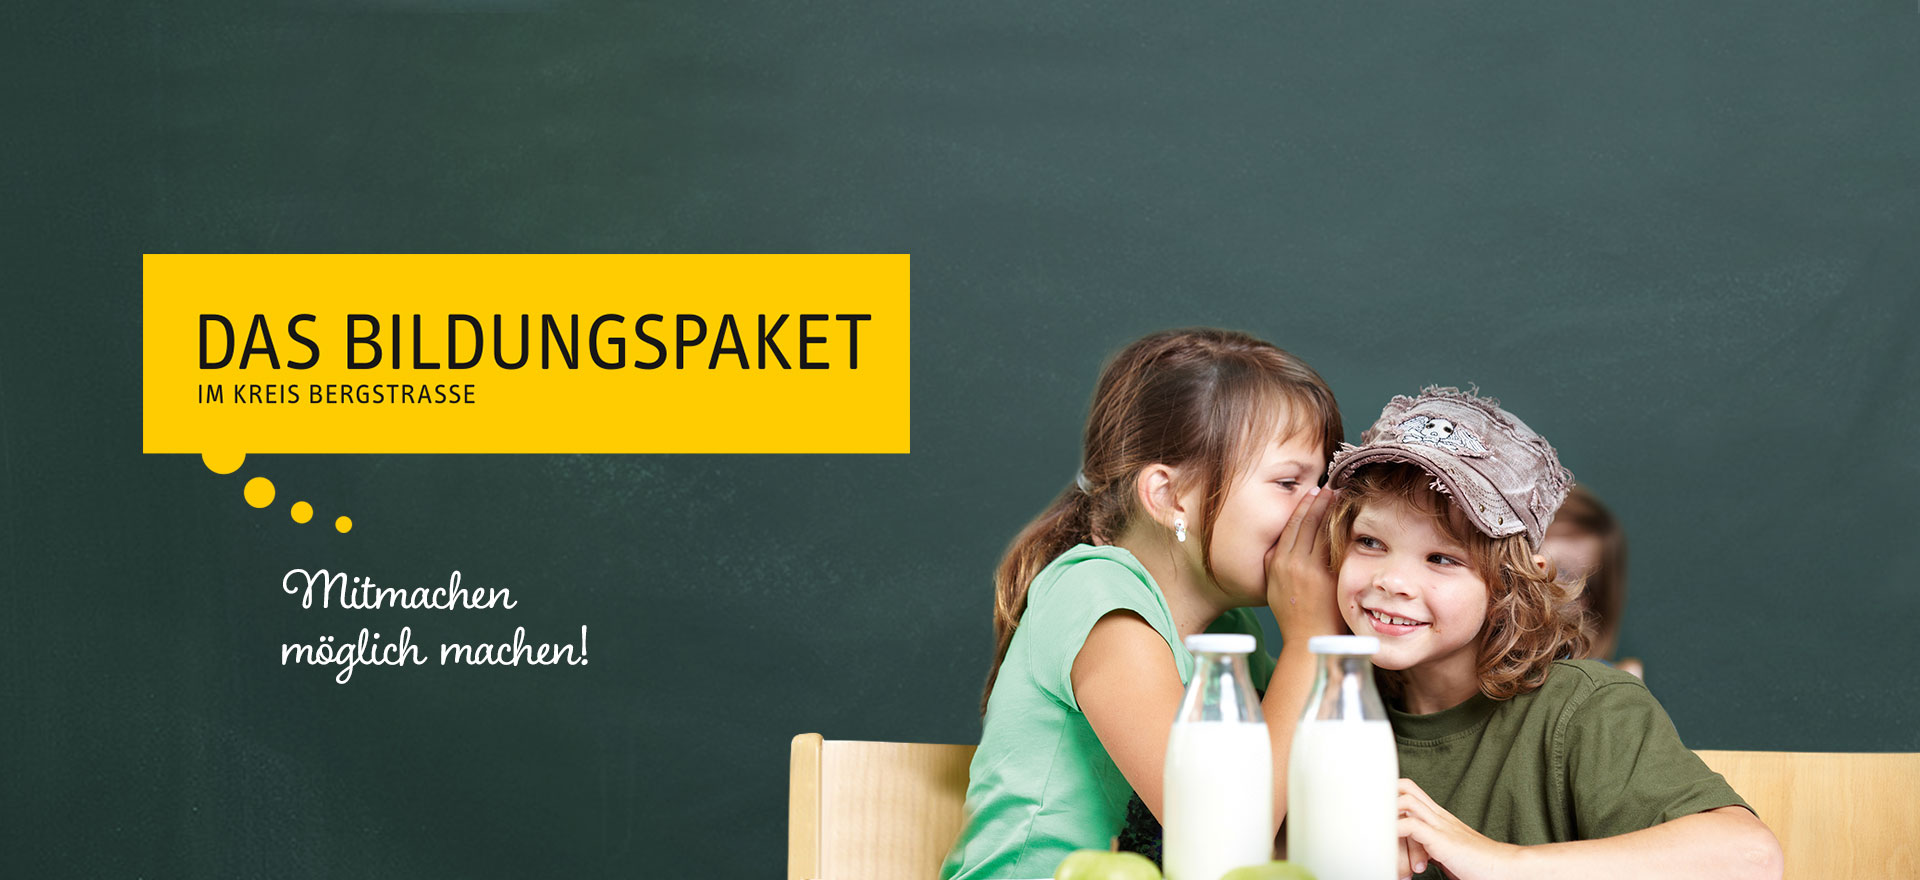 Das Bildungspaket im Kreis Bergstraße